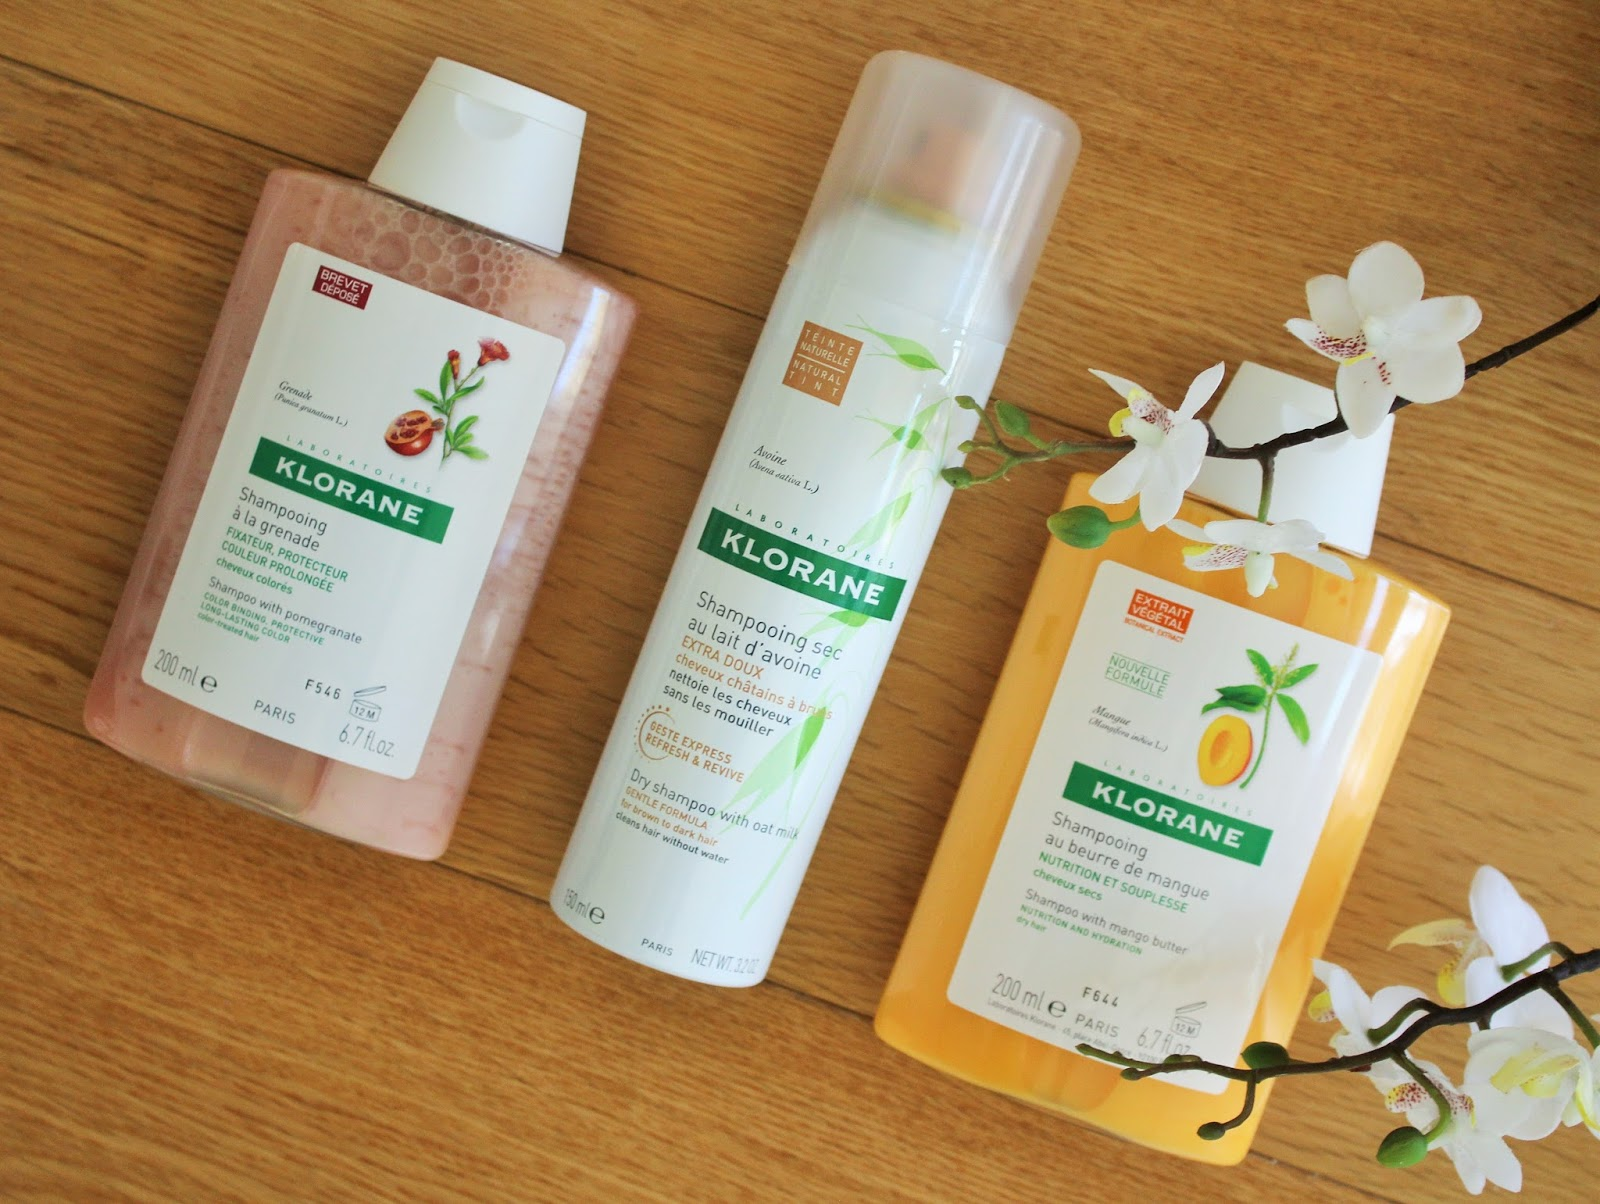 Klorane Shampoos 1